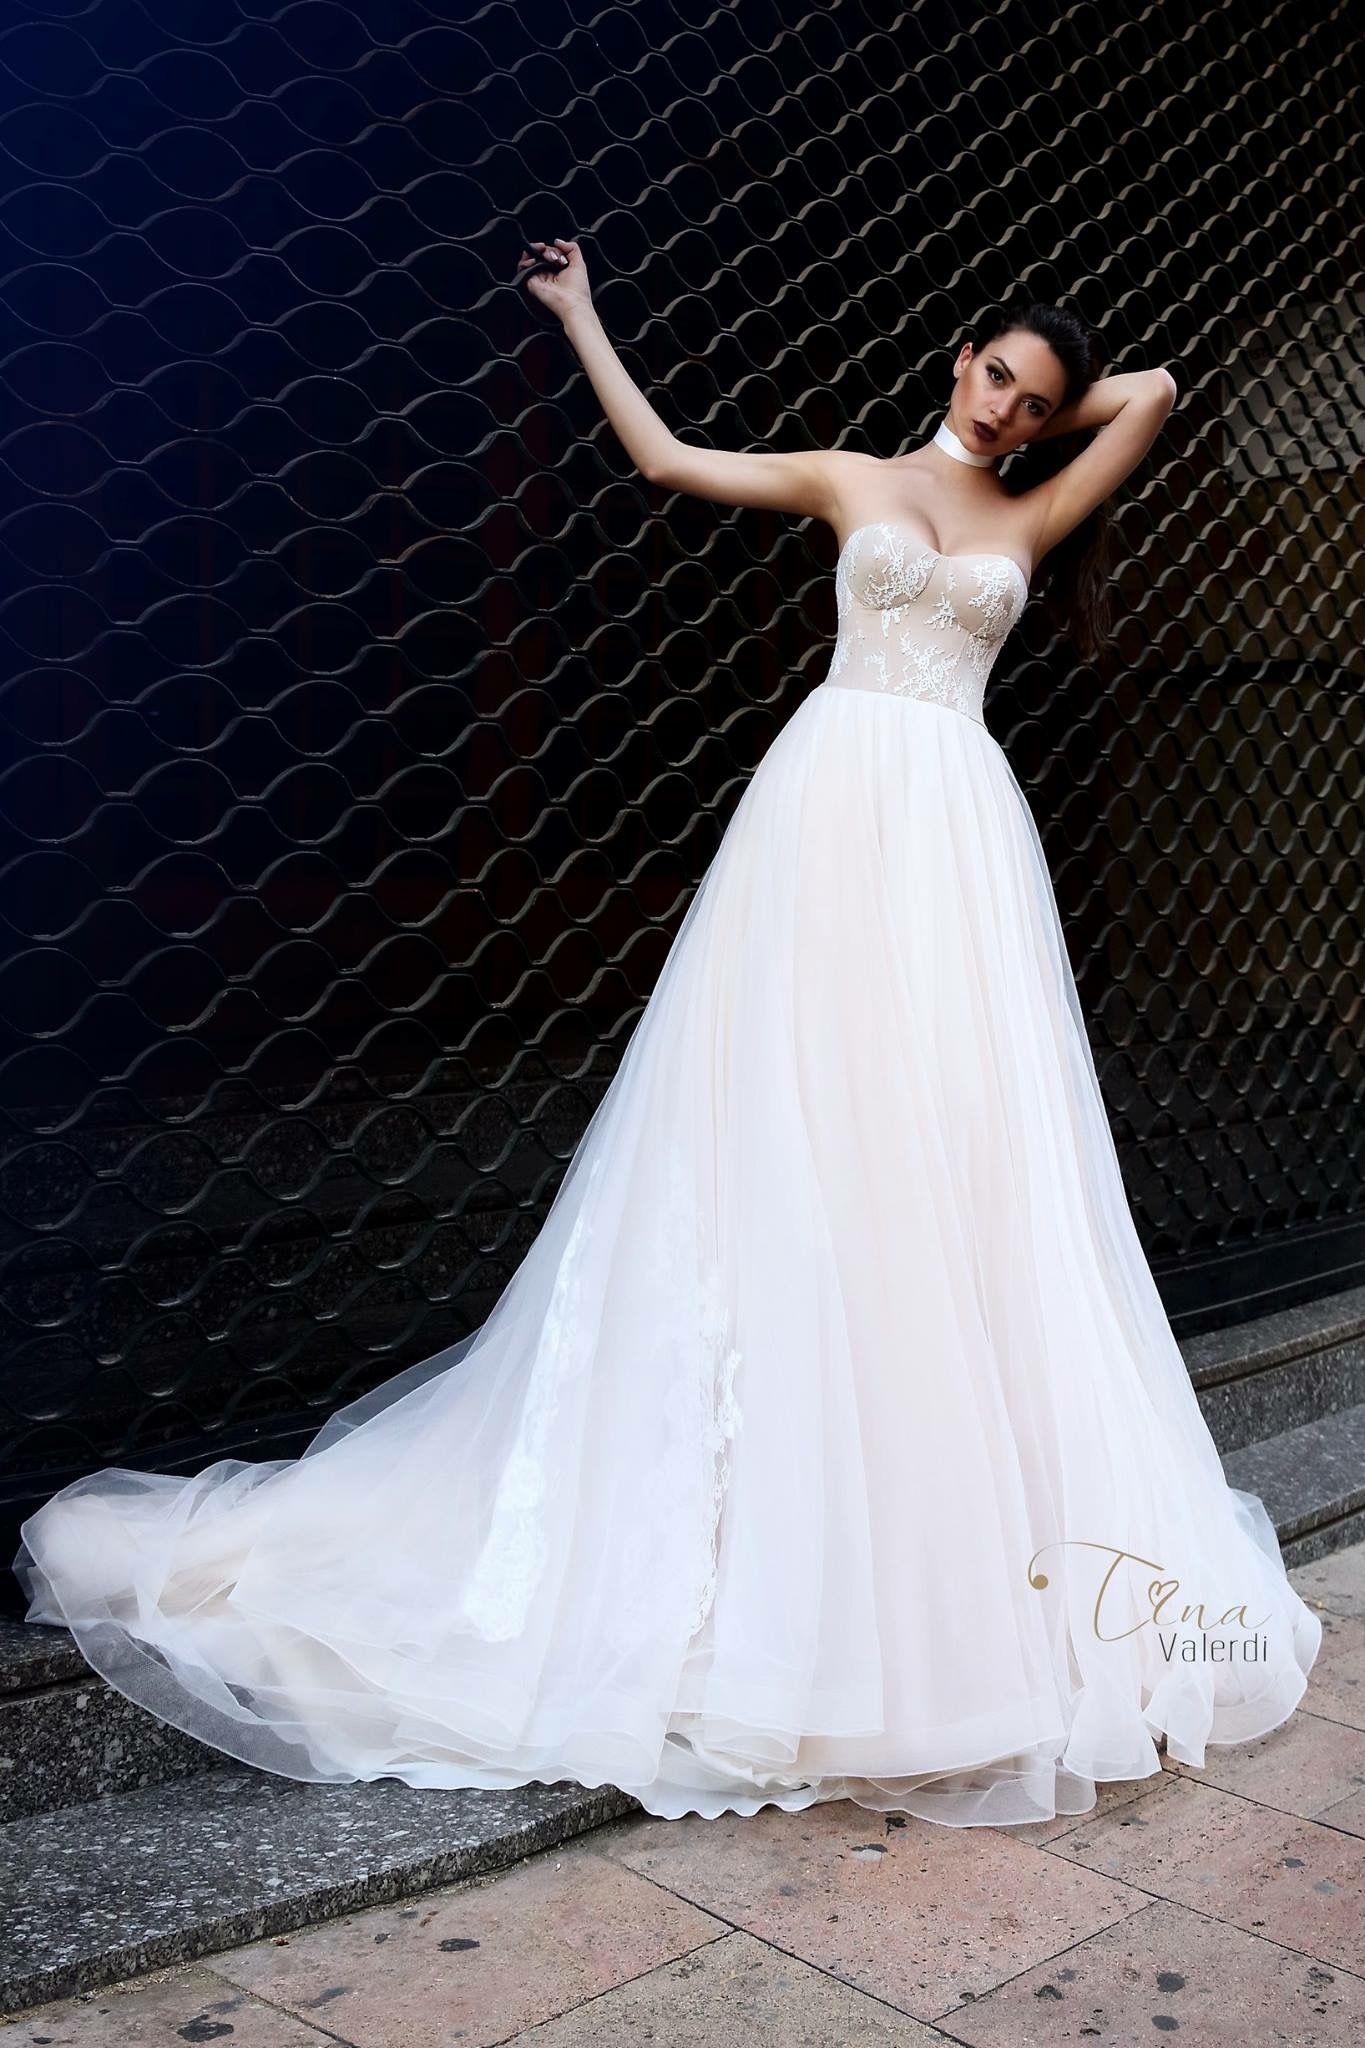 Modern and fabulous wedding dress by tinavalerdi Barcelona